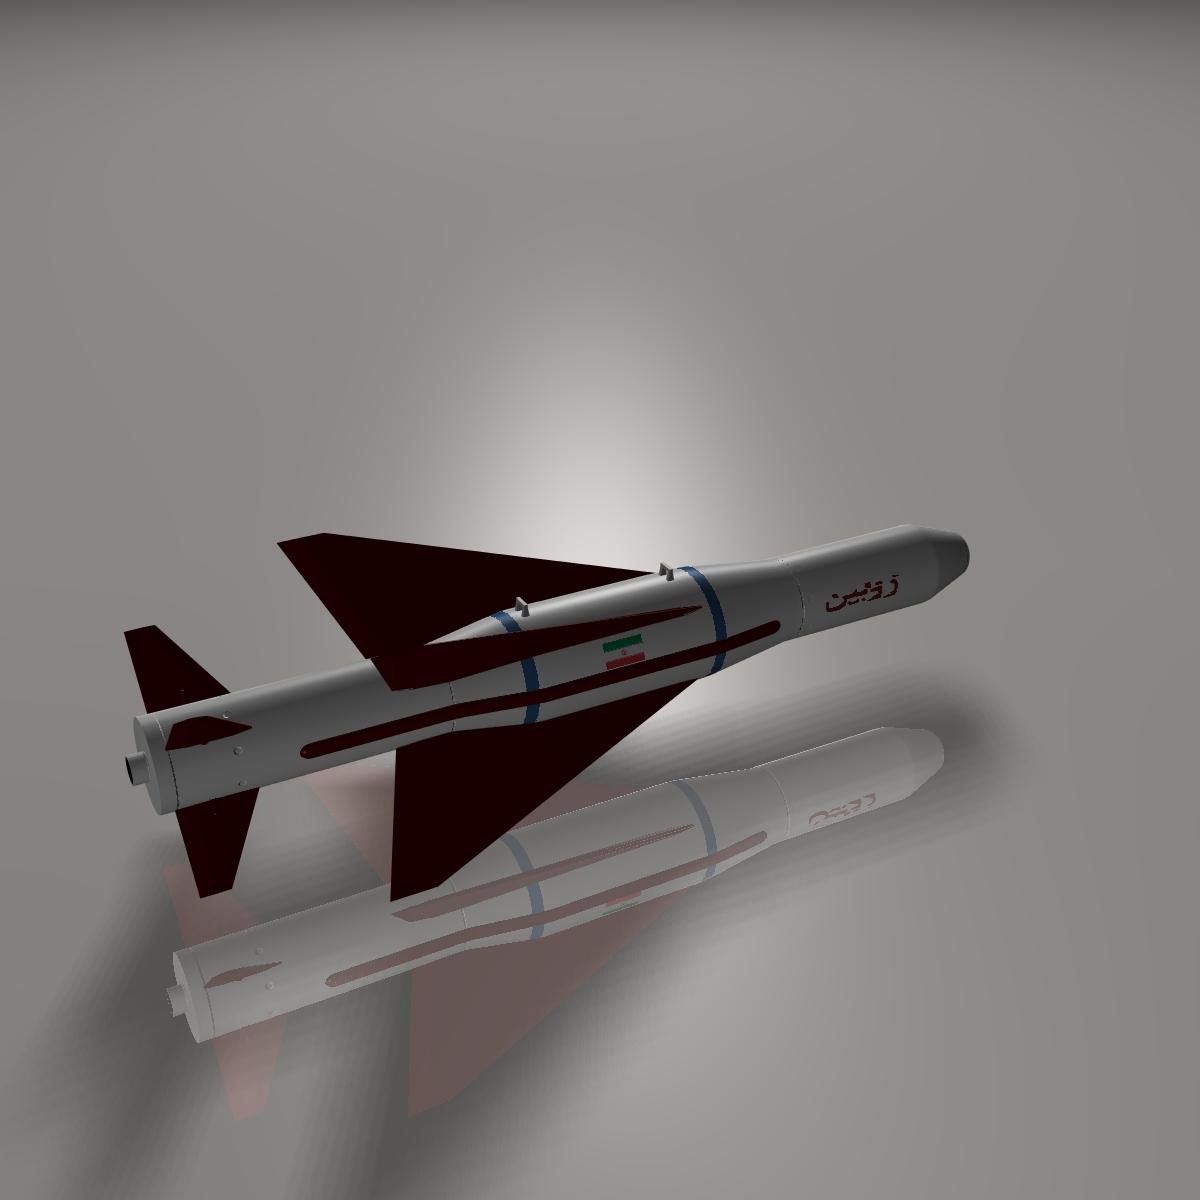 iranian agm-379 zoobin asm missile 3d model 3ds dxf fbx blend cob dae x obj 150587